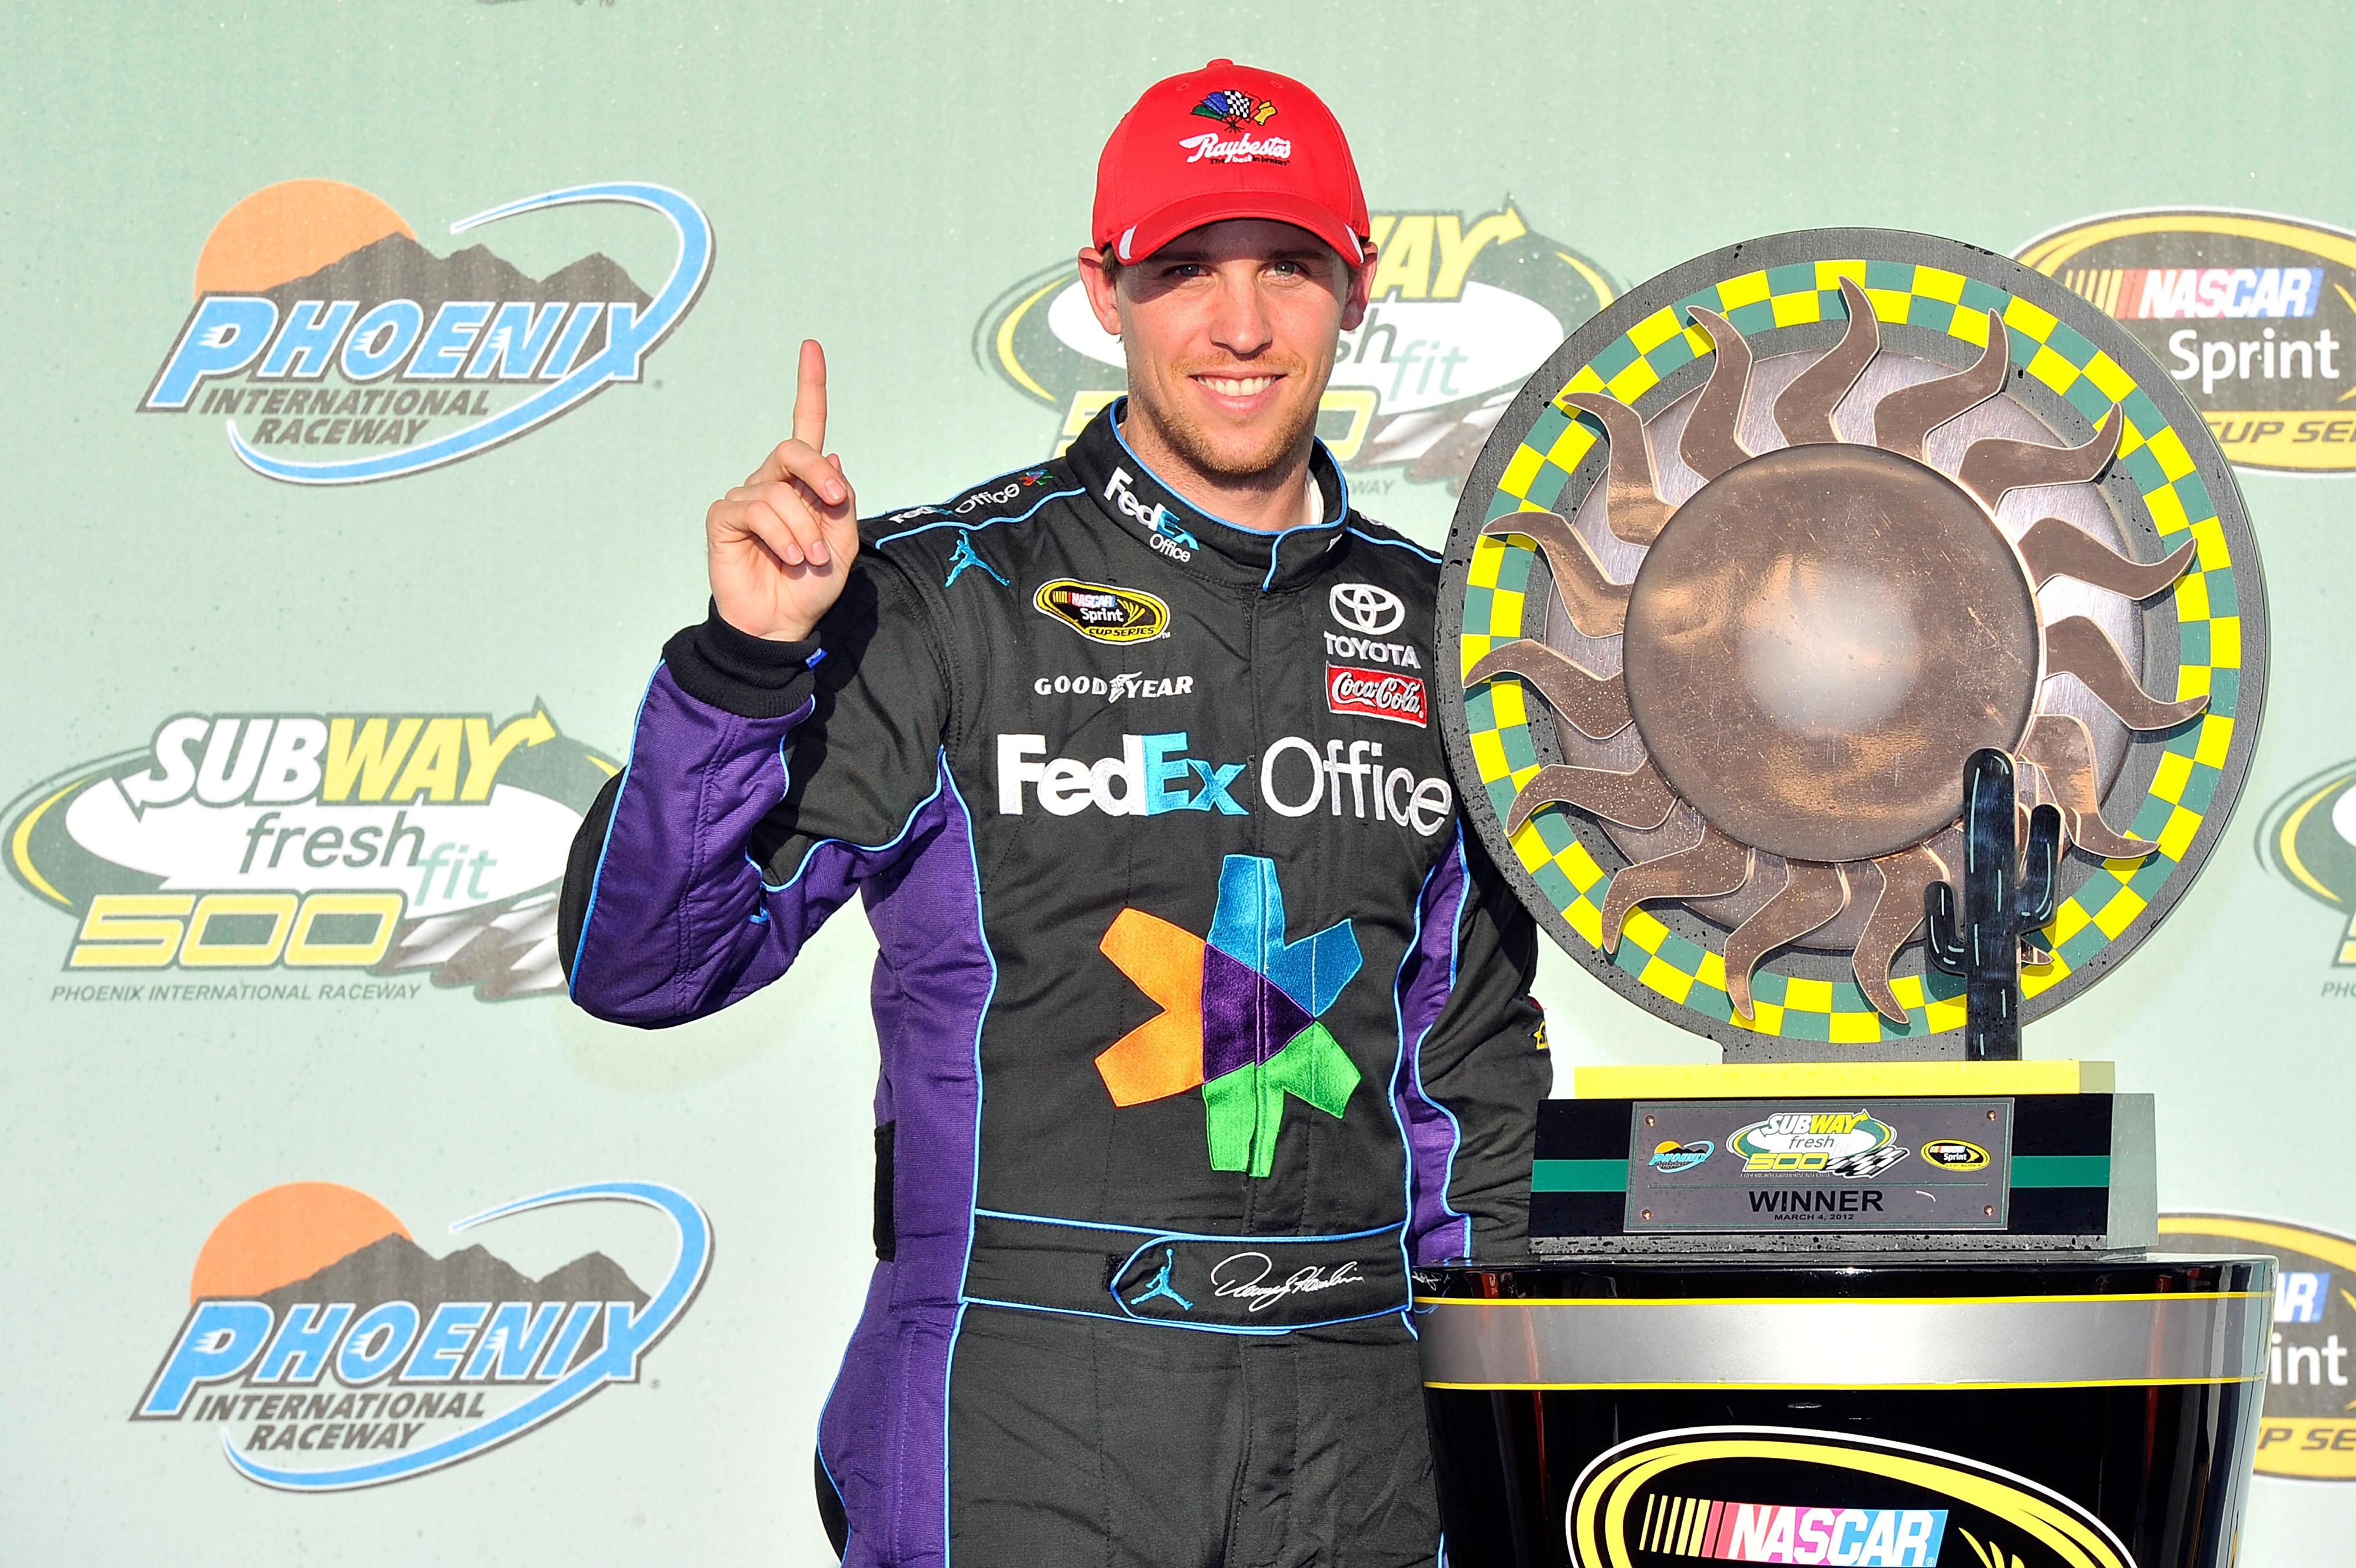 Raybestos brakes help Denny Hamlin secure his first phoenix win